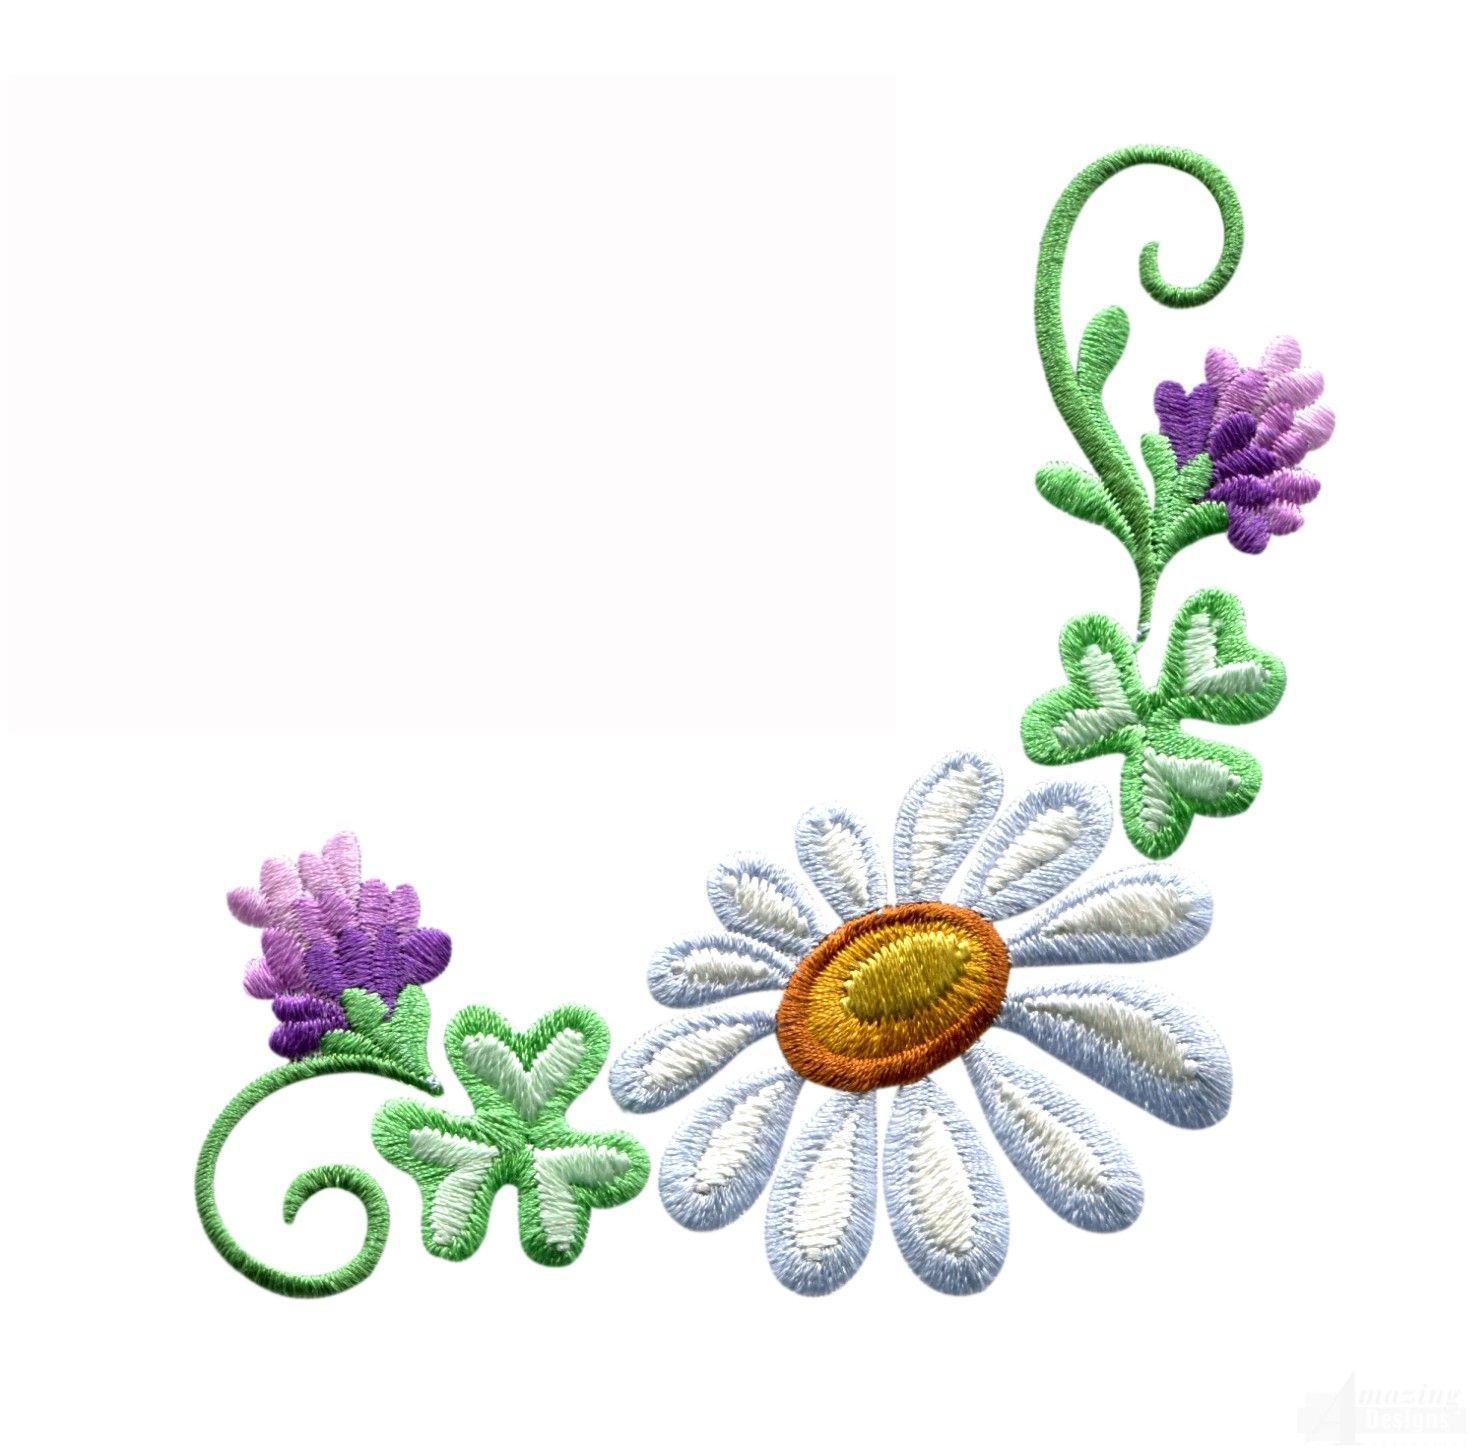 Daisy floral border 3 embroidery design haft maszynowy embroidery daisy floral border 3 embroidery design izmirmasajfo